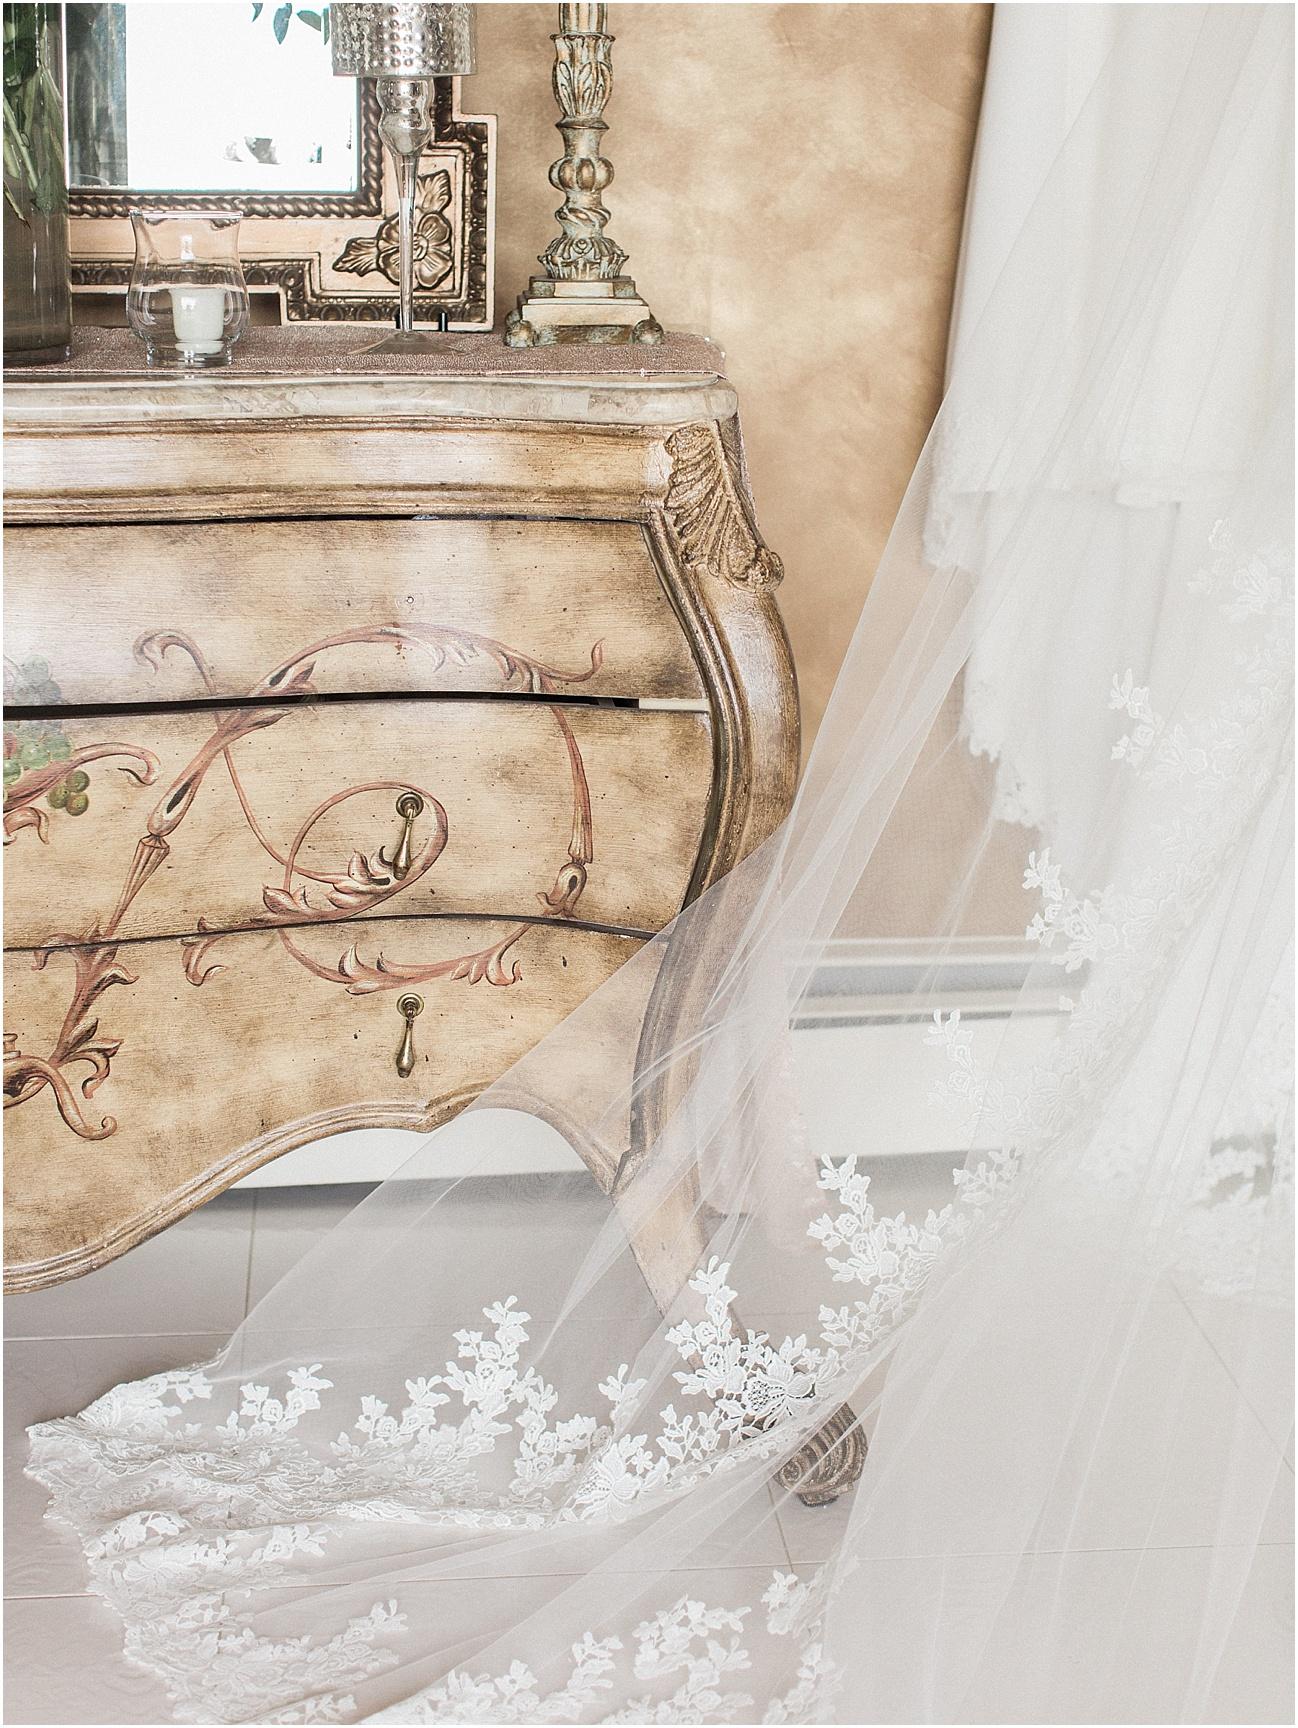 bianca_chris_danversport_italian_blush_gold_north_shore_cape_cod_boston_wedding_photographer_meredith_jane_photography_photo_1106.jpg